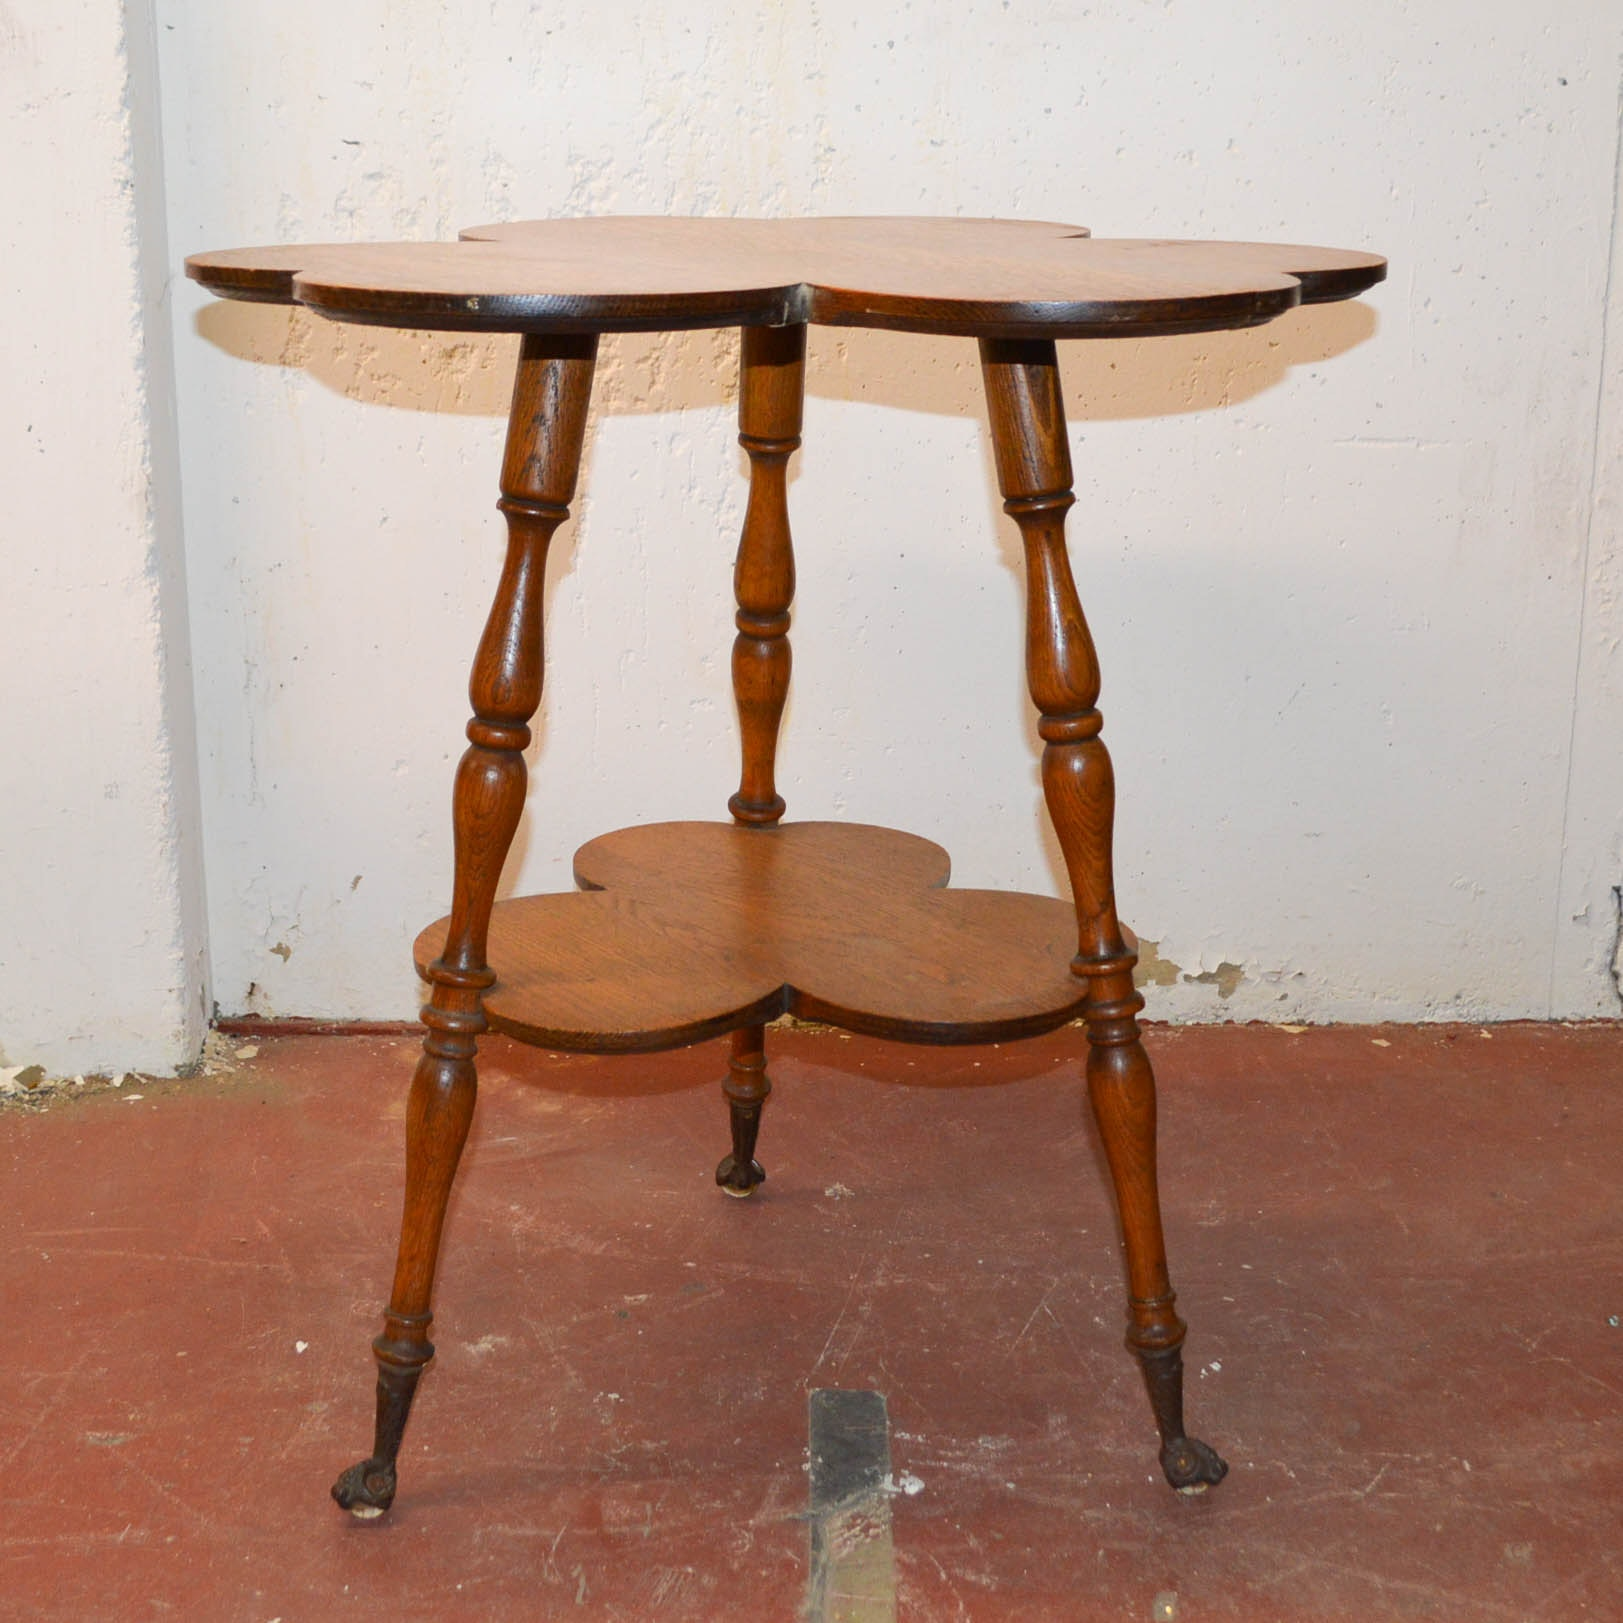 Antique Oak Clover Shaped Side Table